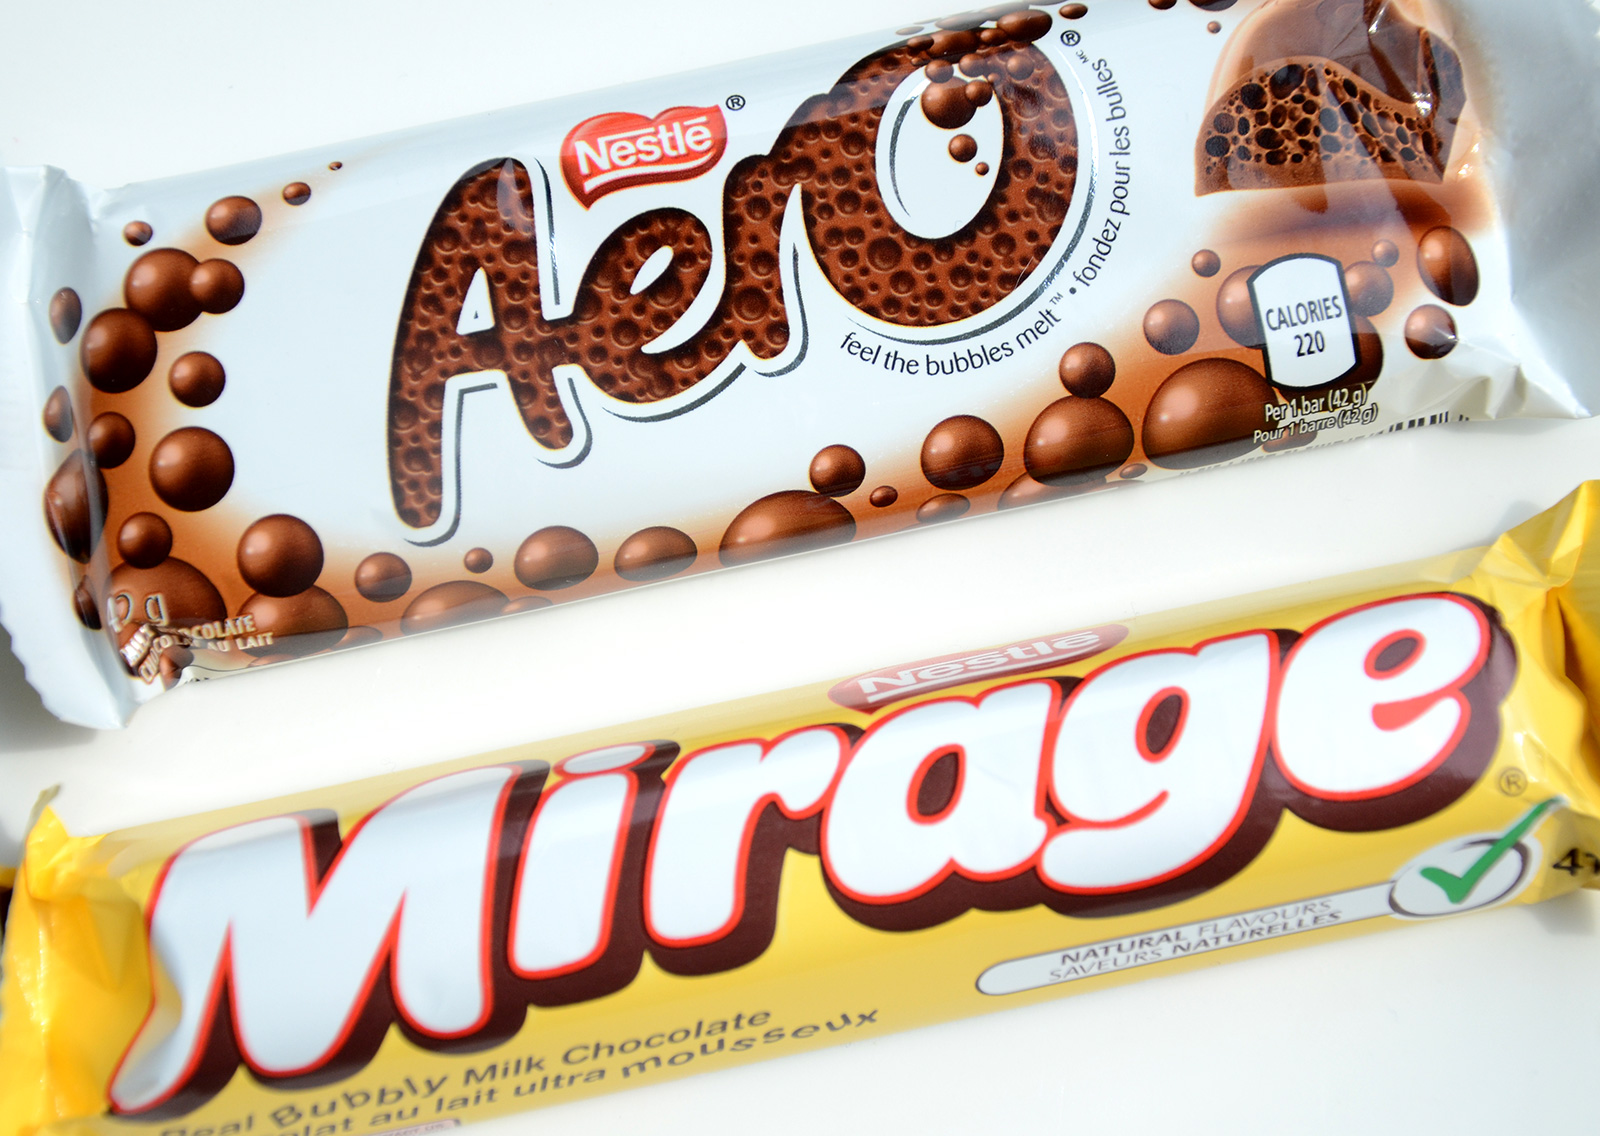 Aero and Mirage chocolate bars